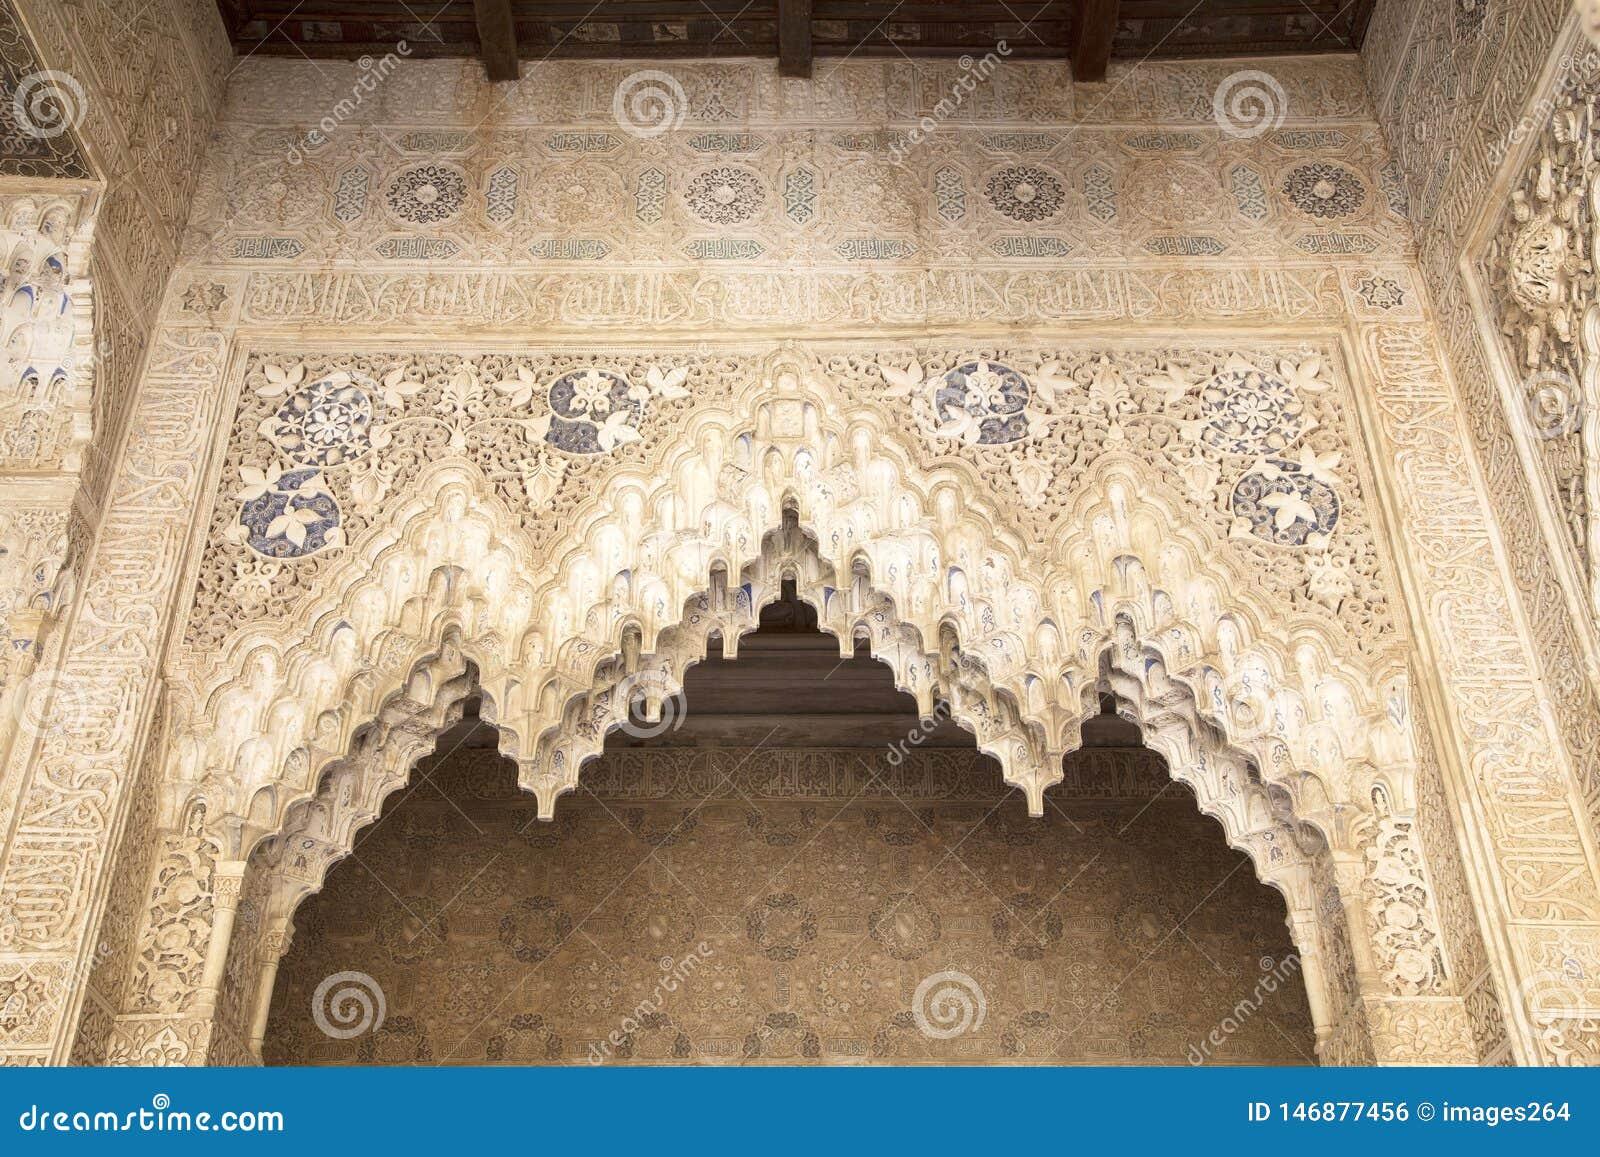 Lacework stucco in the Alhambra of Granada